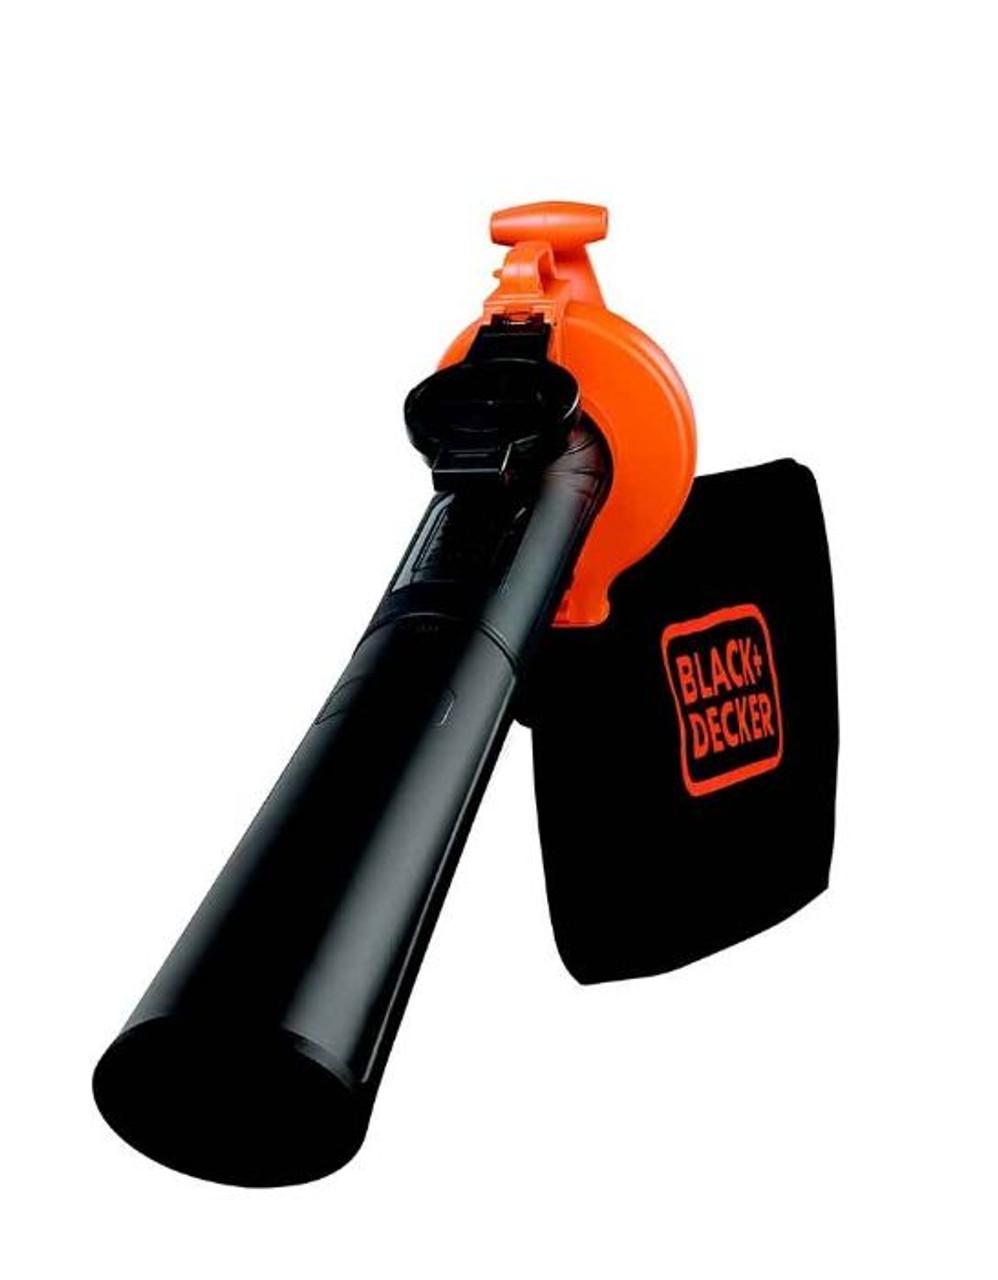 Black and Decker Blower Vac 2500W